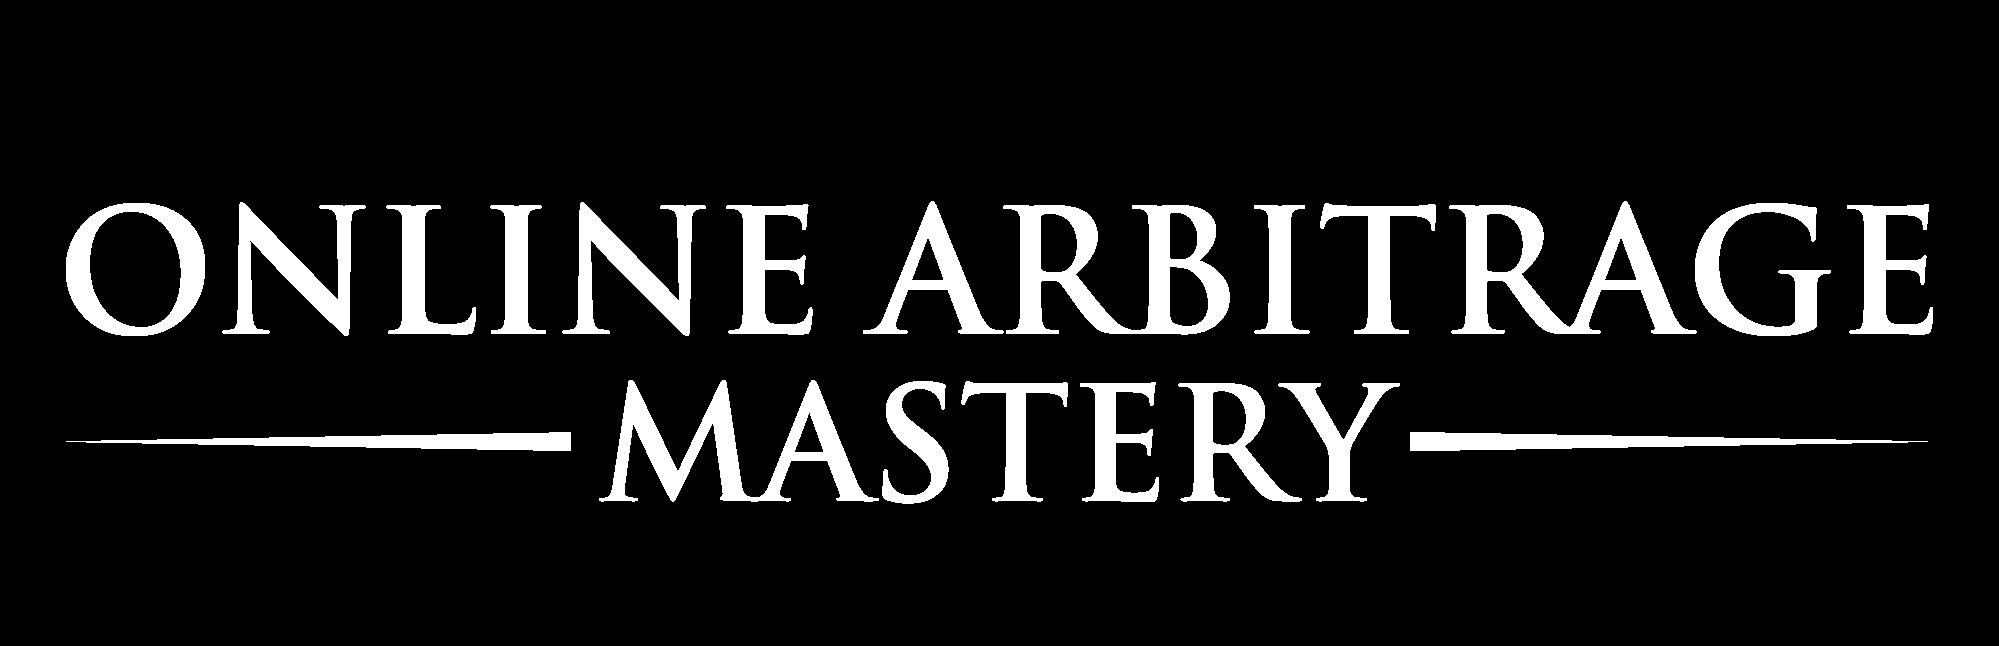 Online Arbitrage Mastery